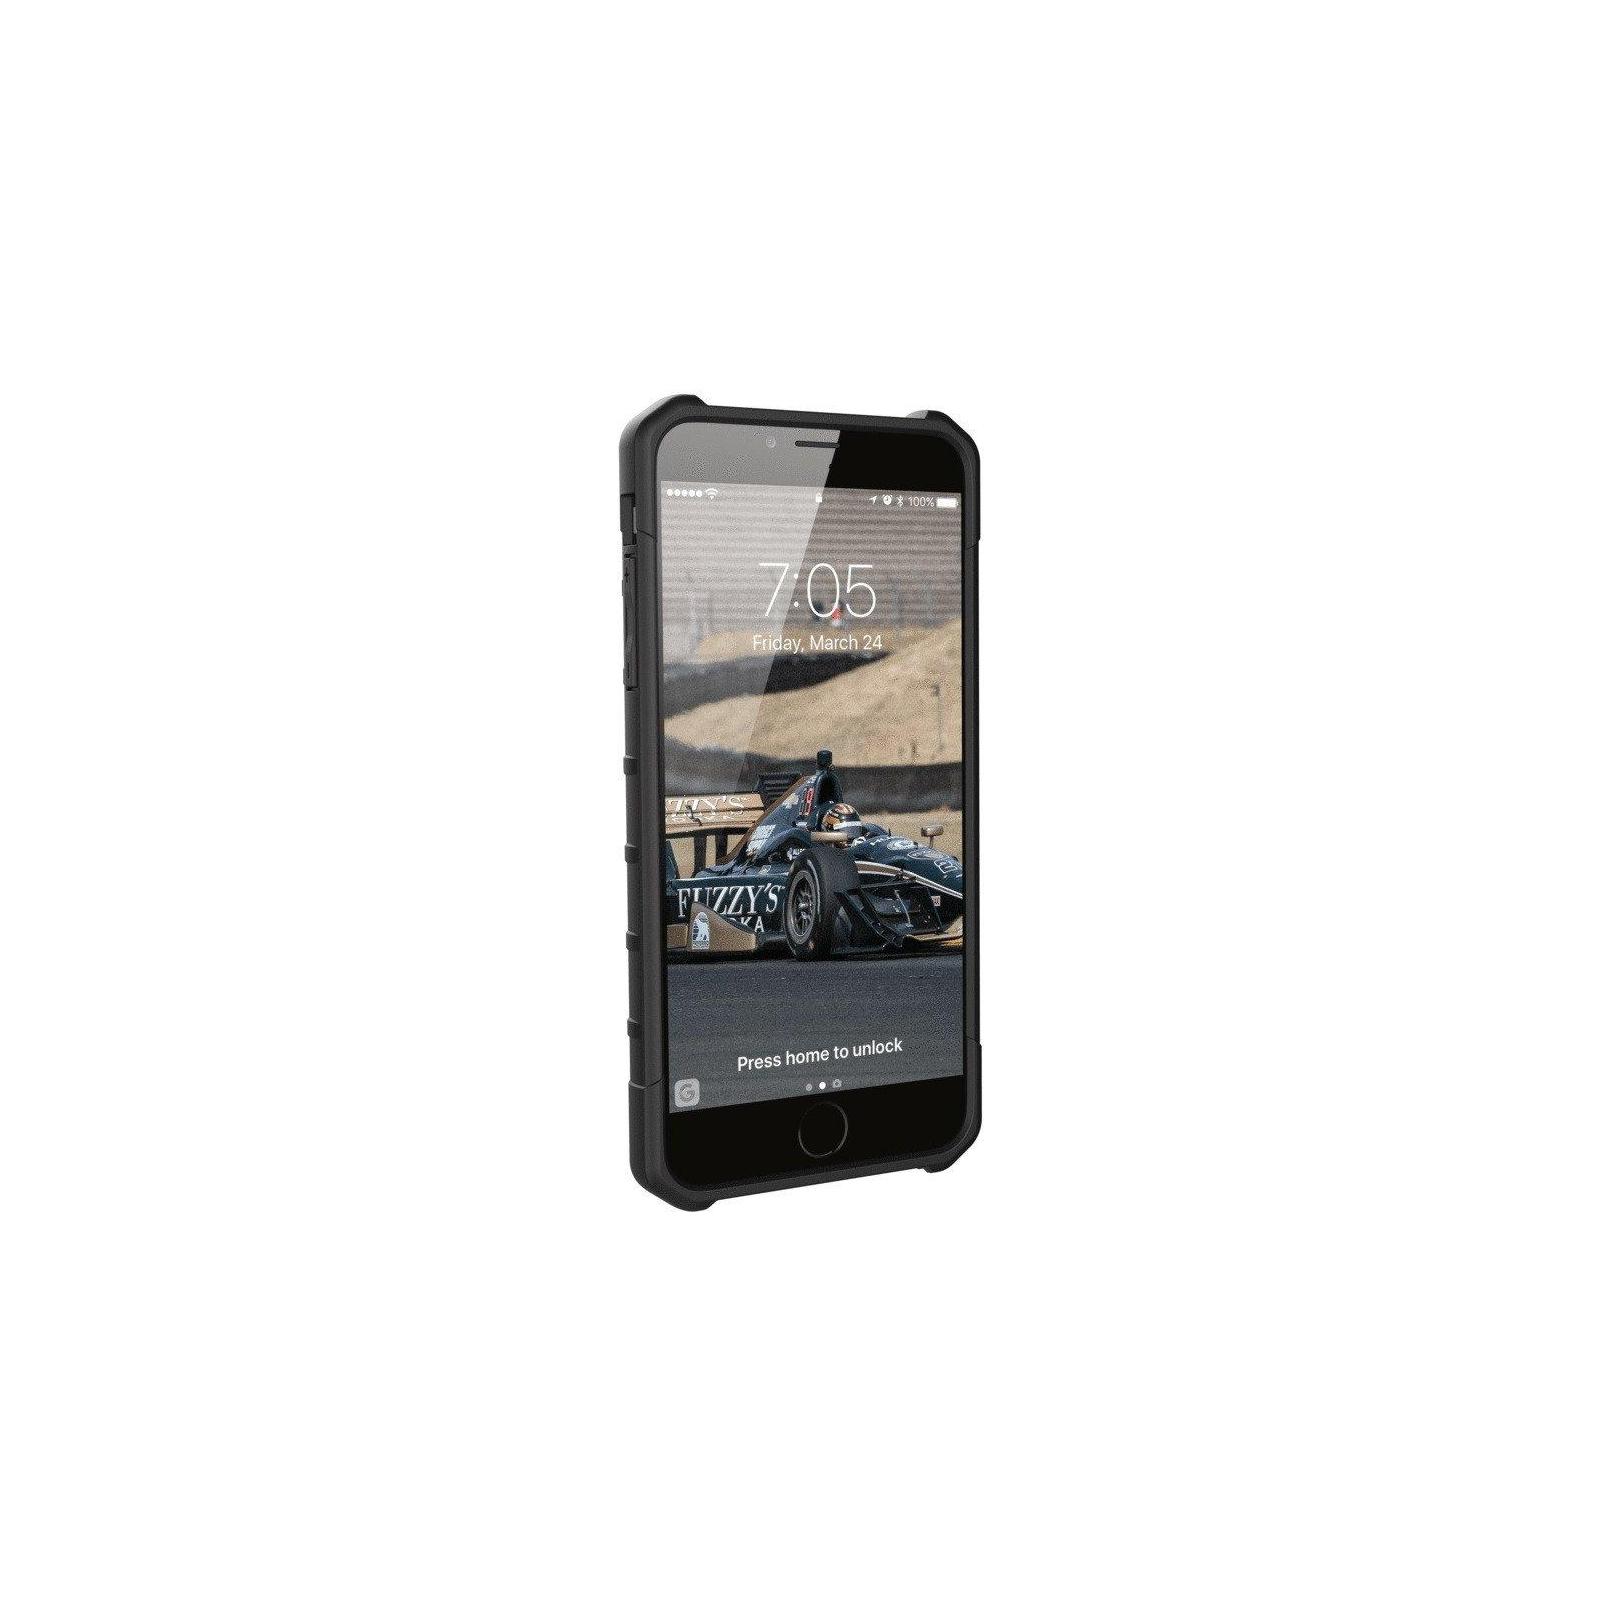 Чехол для моб. телефона Urban Armor Gear iPhone 8/7/6S Plus Pathfinder Camo Gray/Black (IPH8/7PLS-A-BC) изображение 5